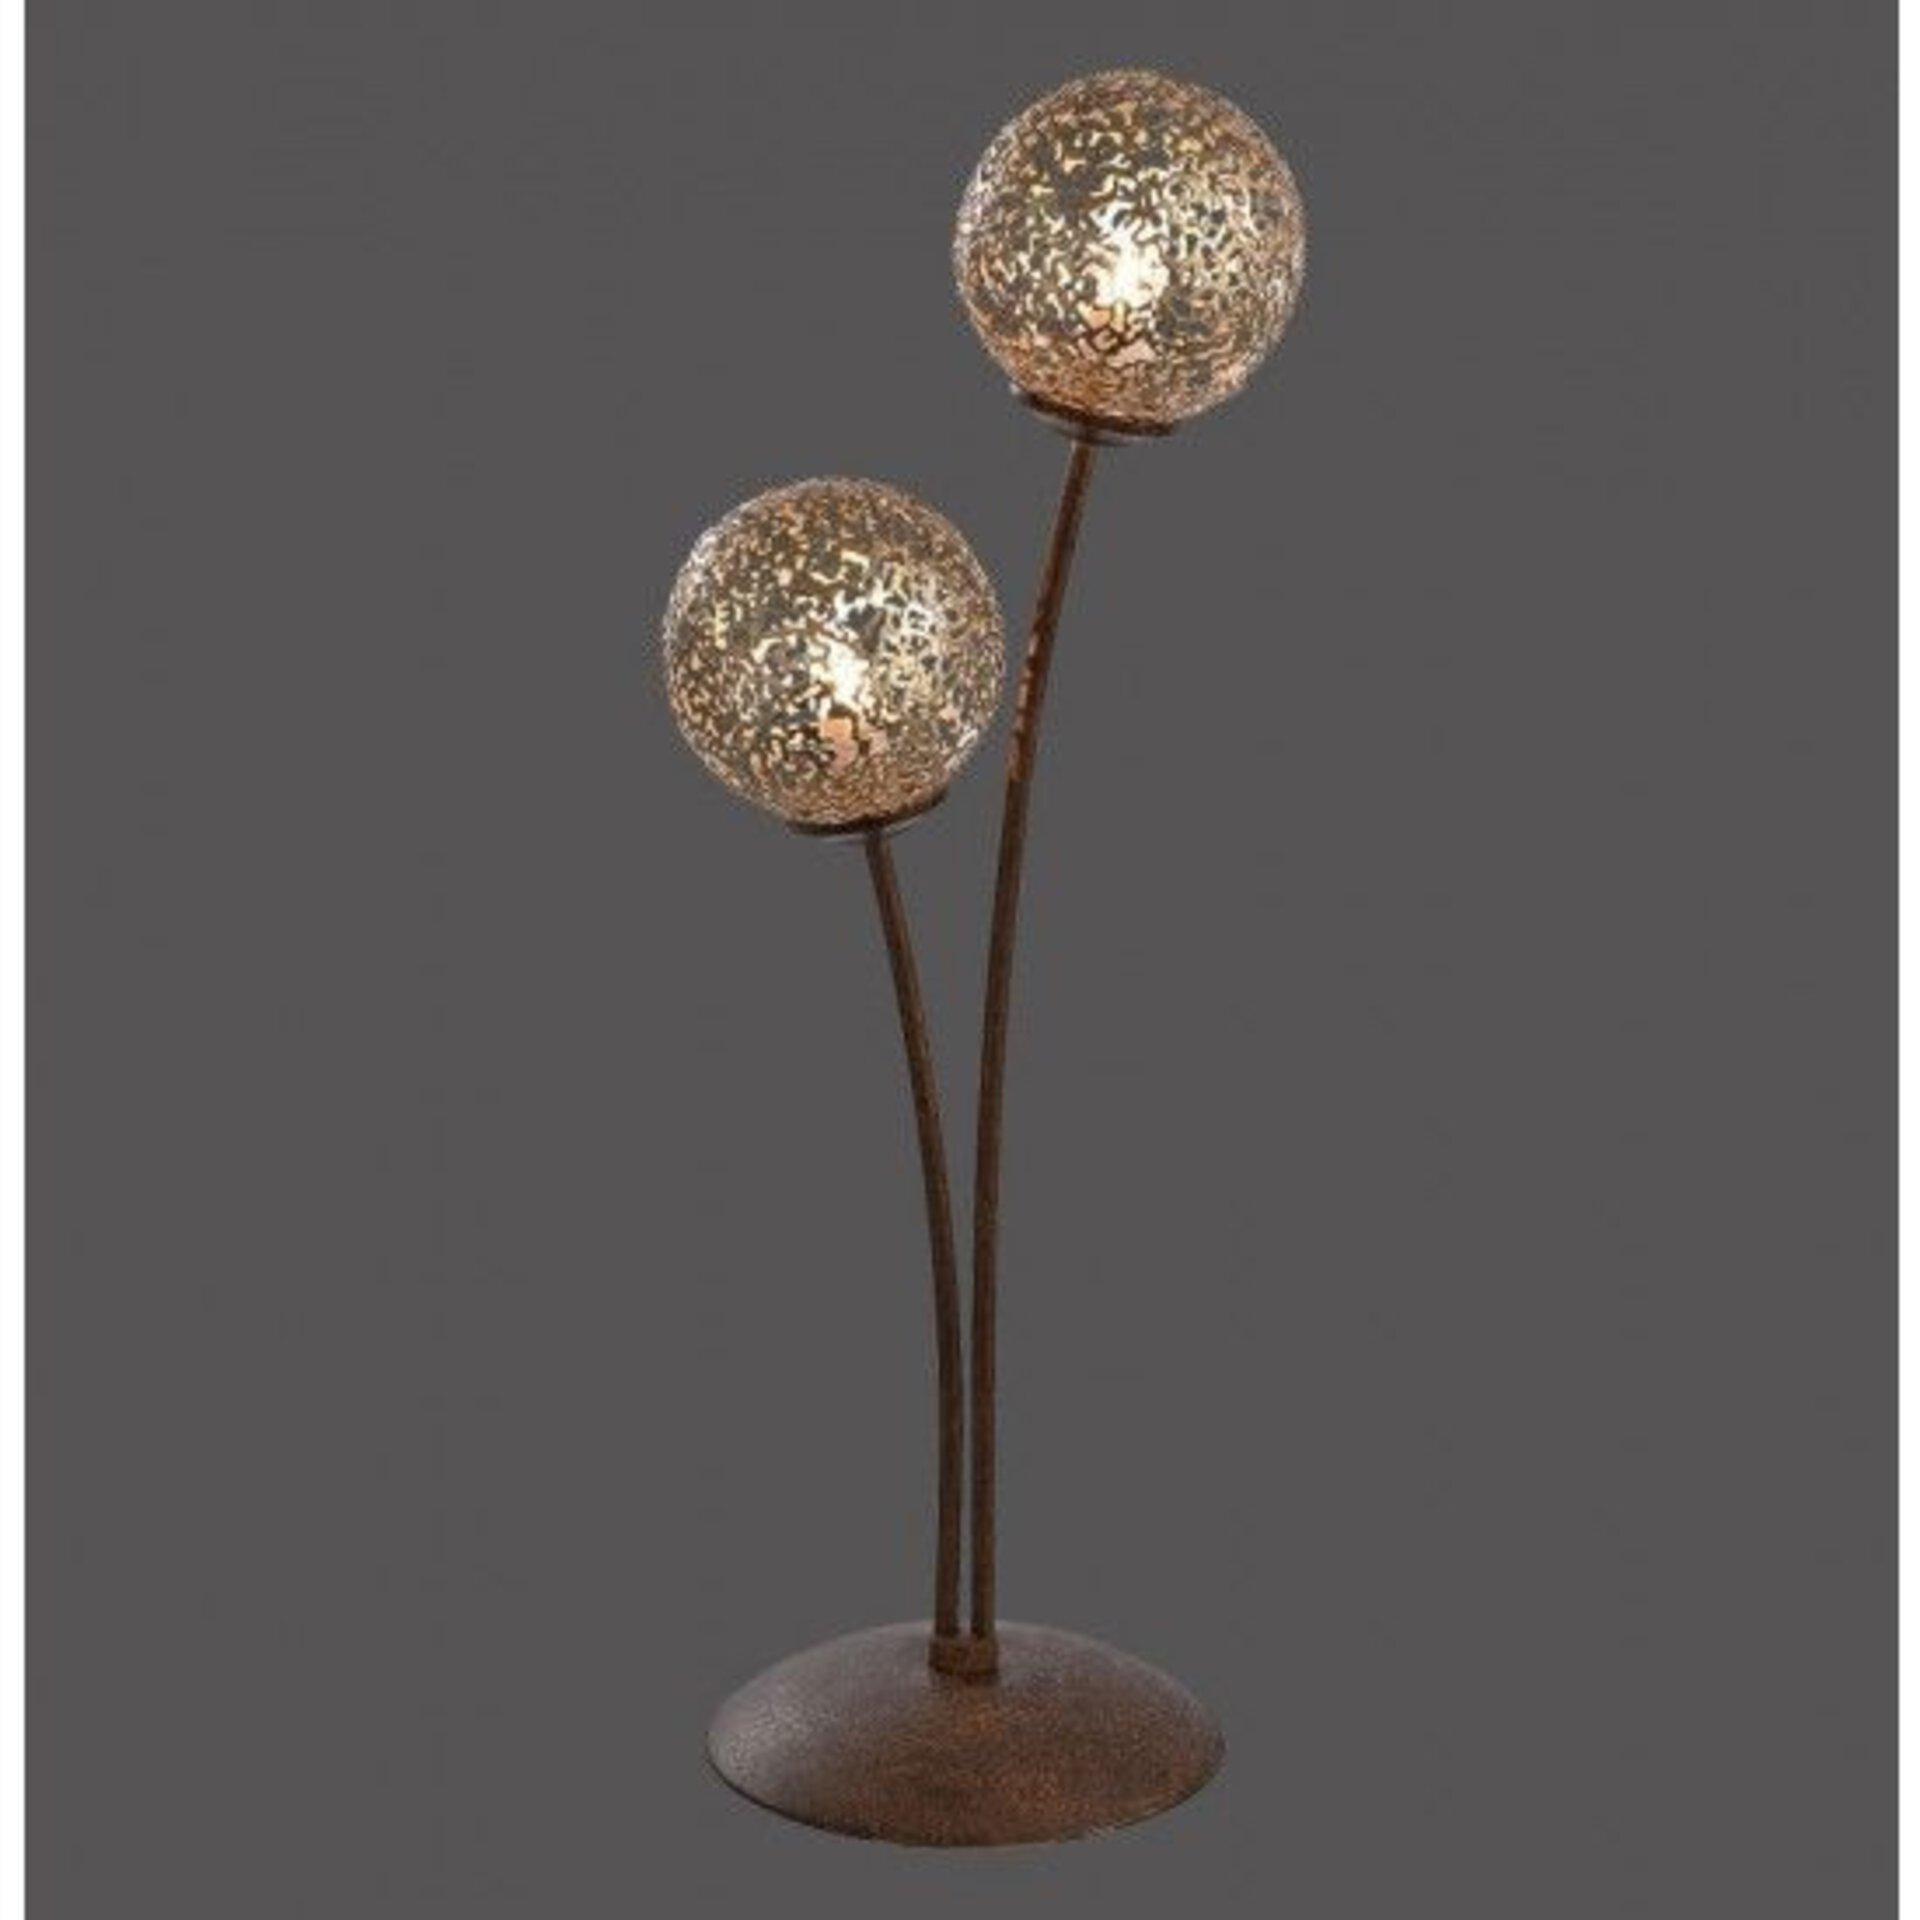 Tischleuchte GRETA Paul Neuhaus Metall 19 x 53 x 19 cm